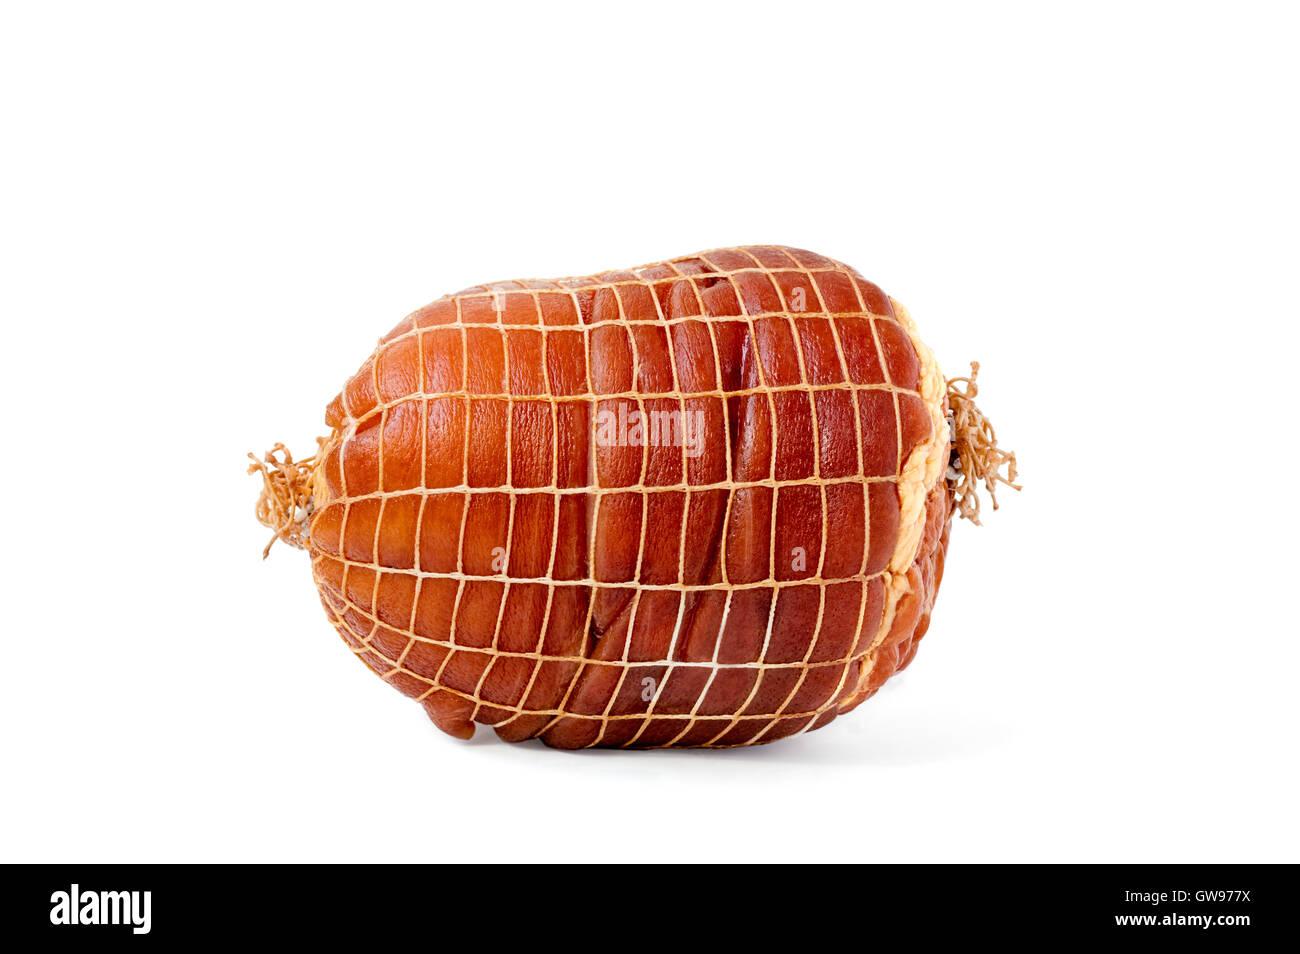 Smoked boneless pork ham hock wrapped in netting isolated on white - Stock Image